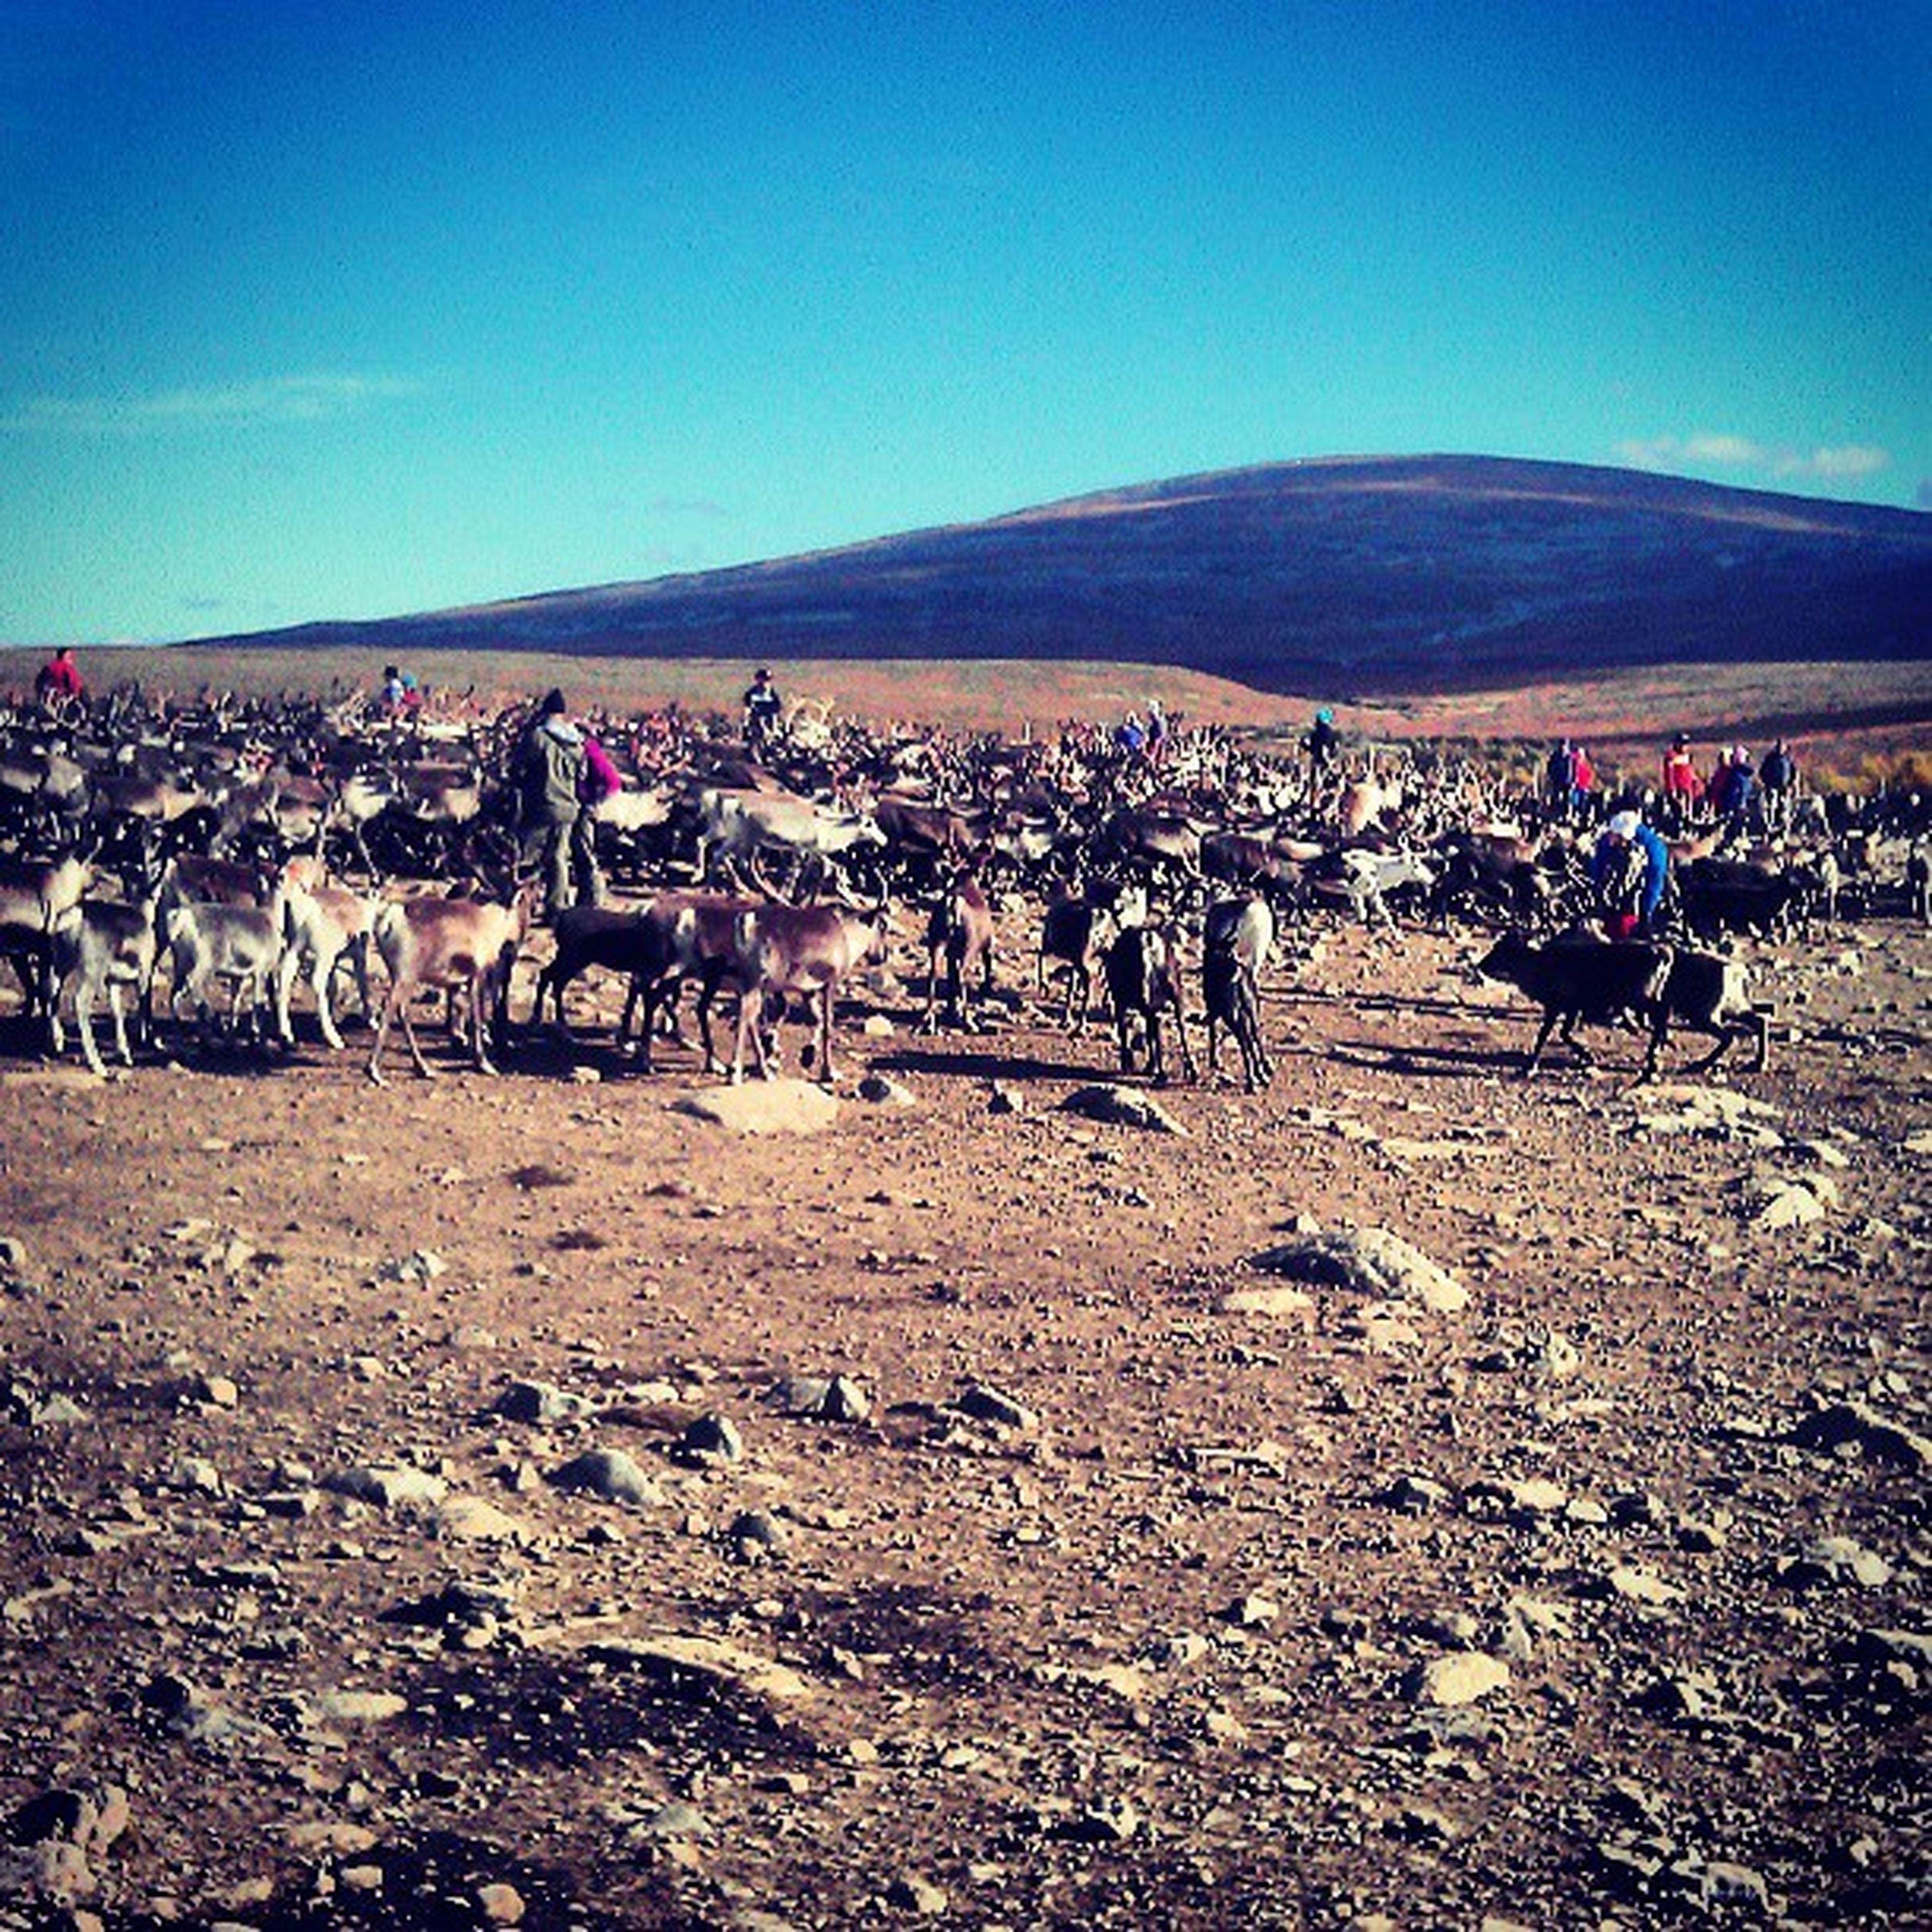 Jamtland Fjällen Samer Renar Sarvslakt Skådespel Reindeer Mountain Northernsweden Myamazingbackyard